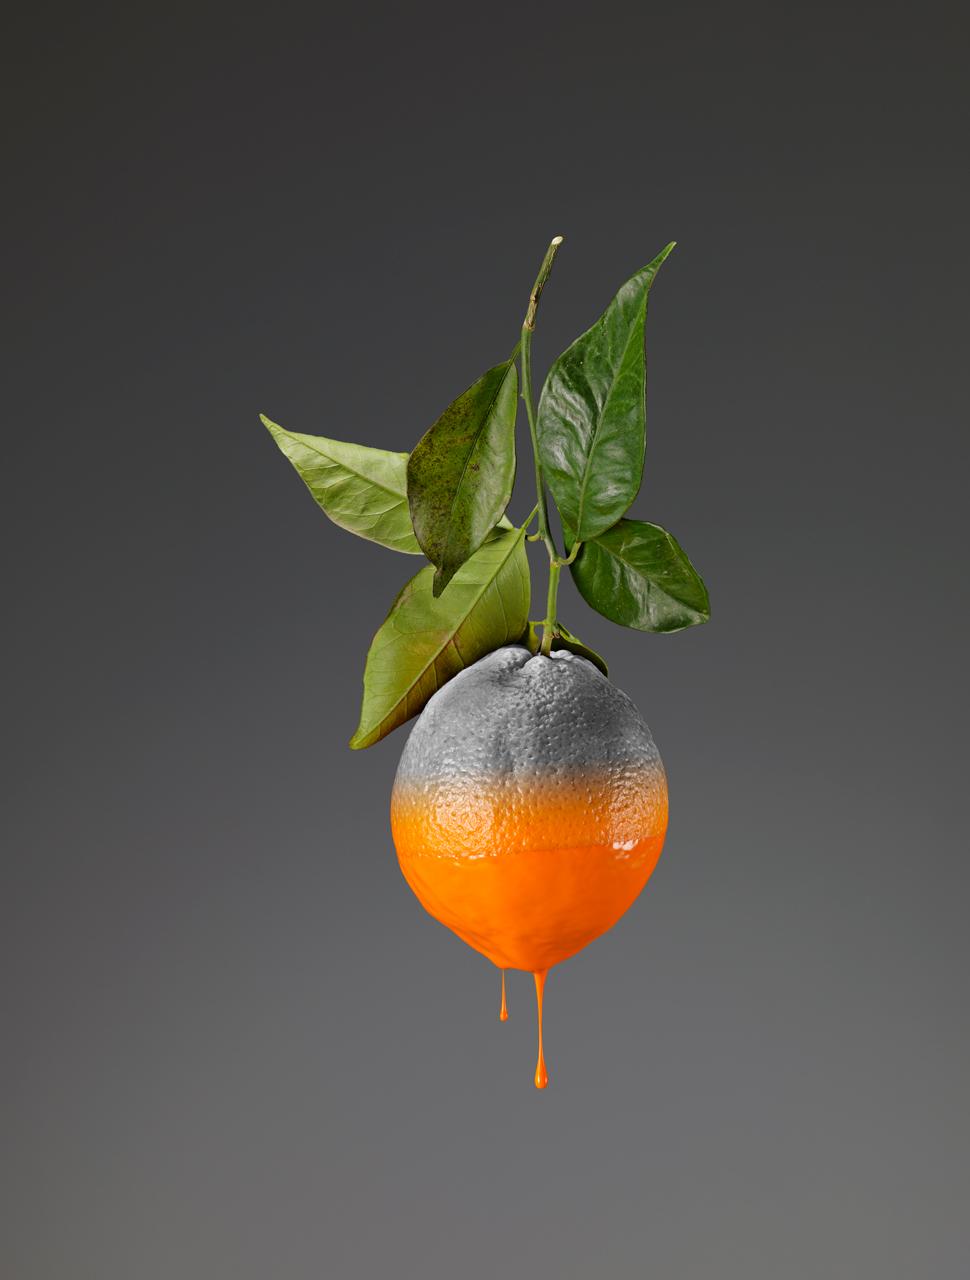 giorgio-cravero-colors-series-1.jpg